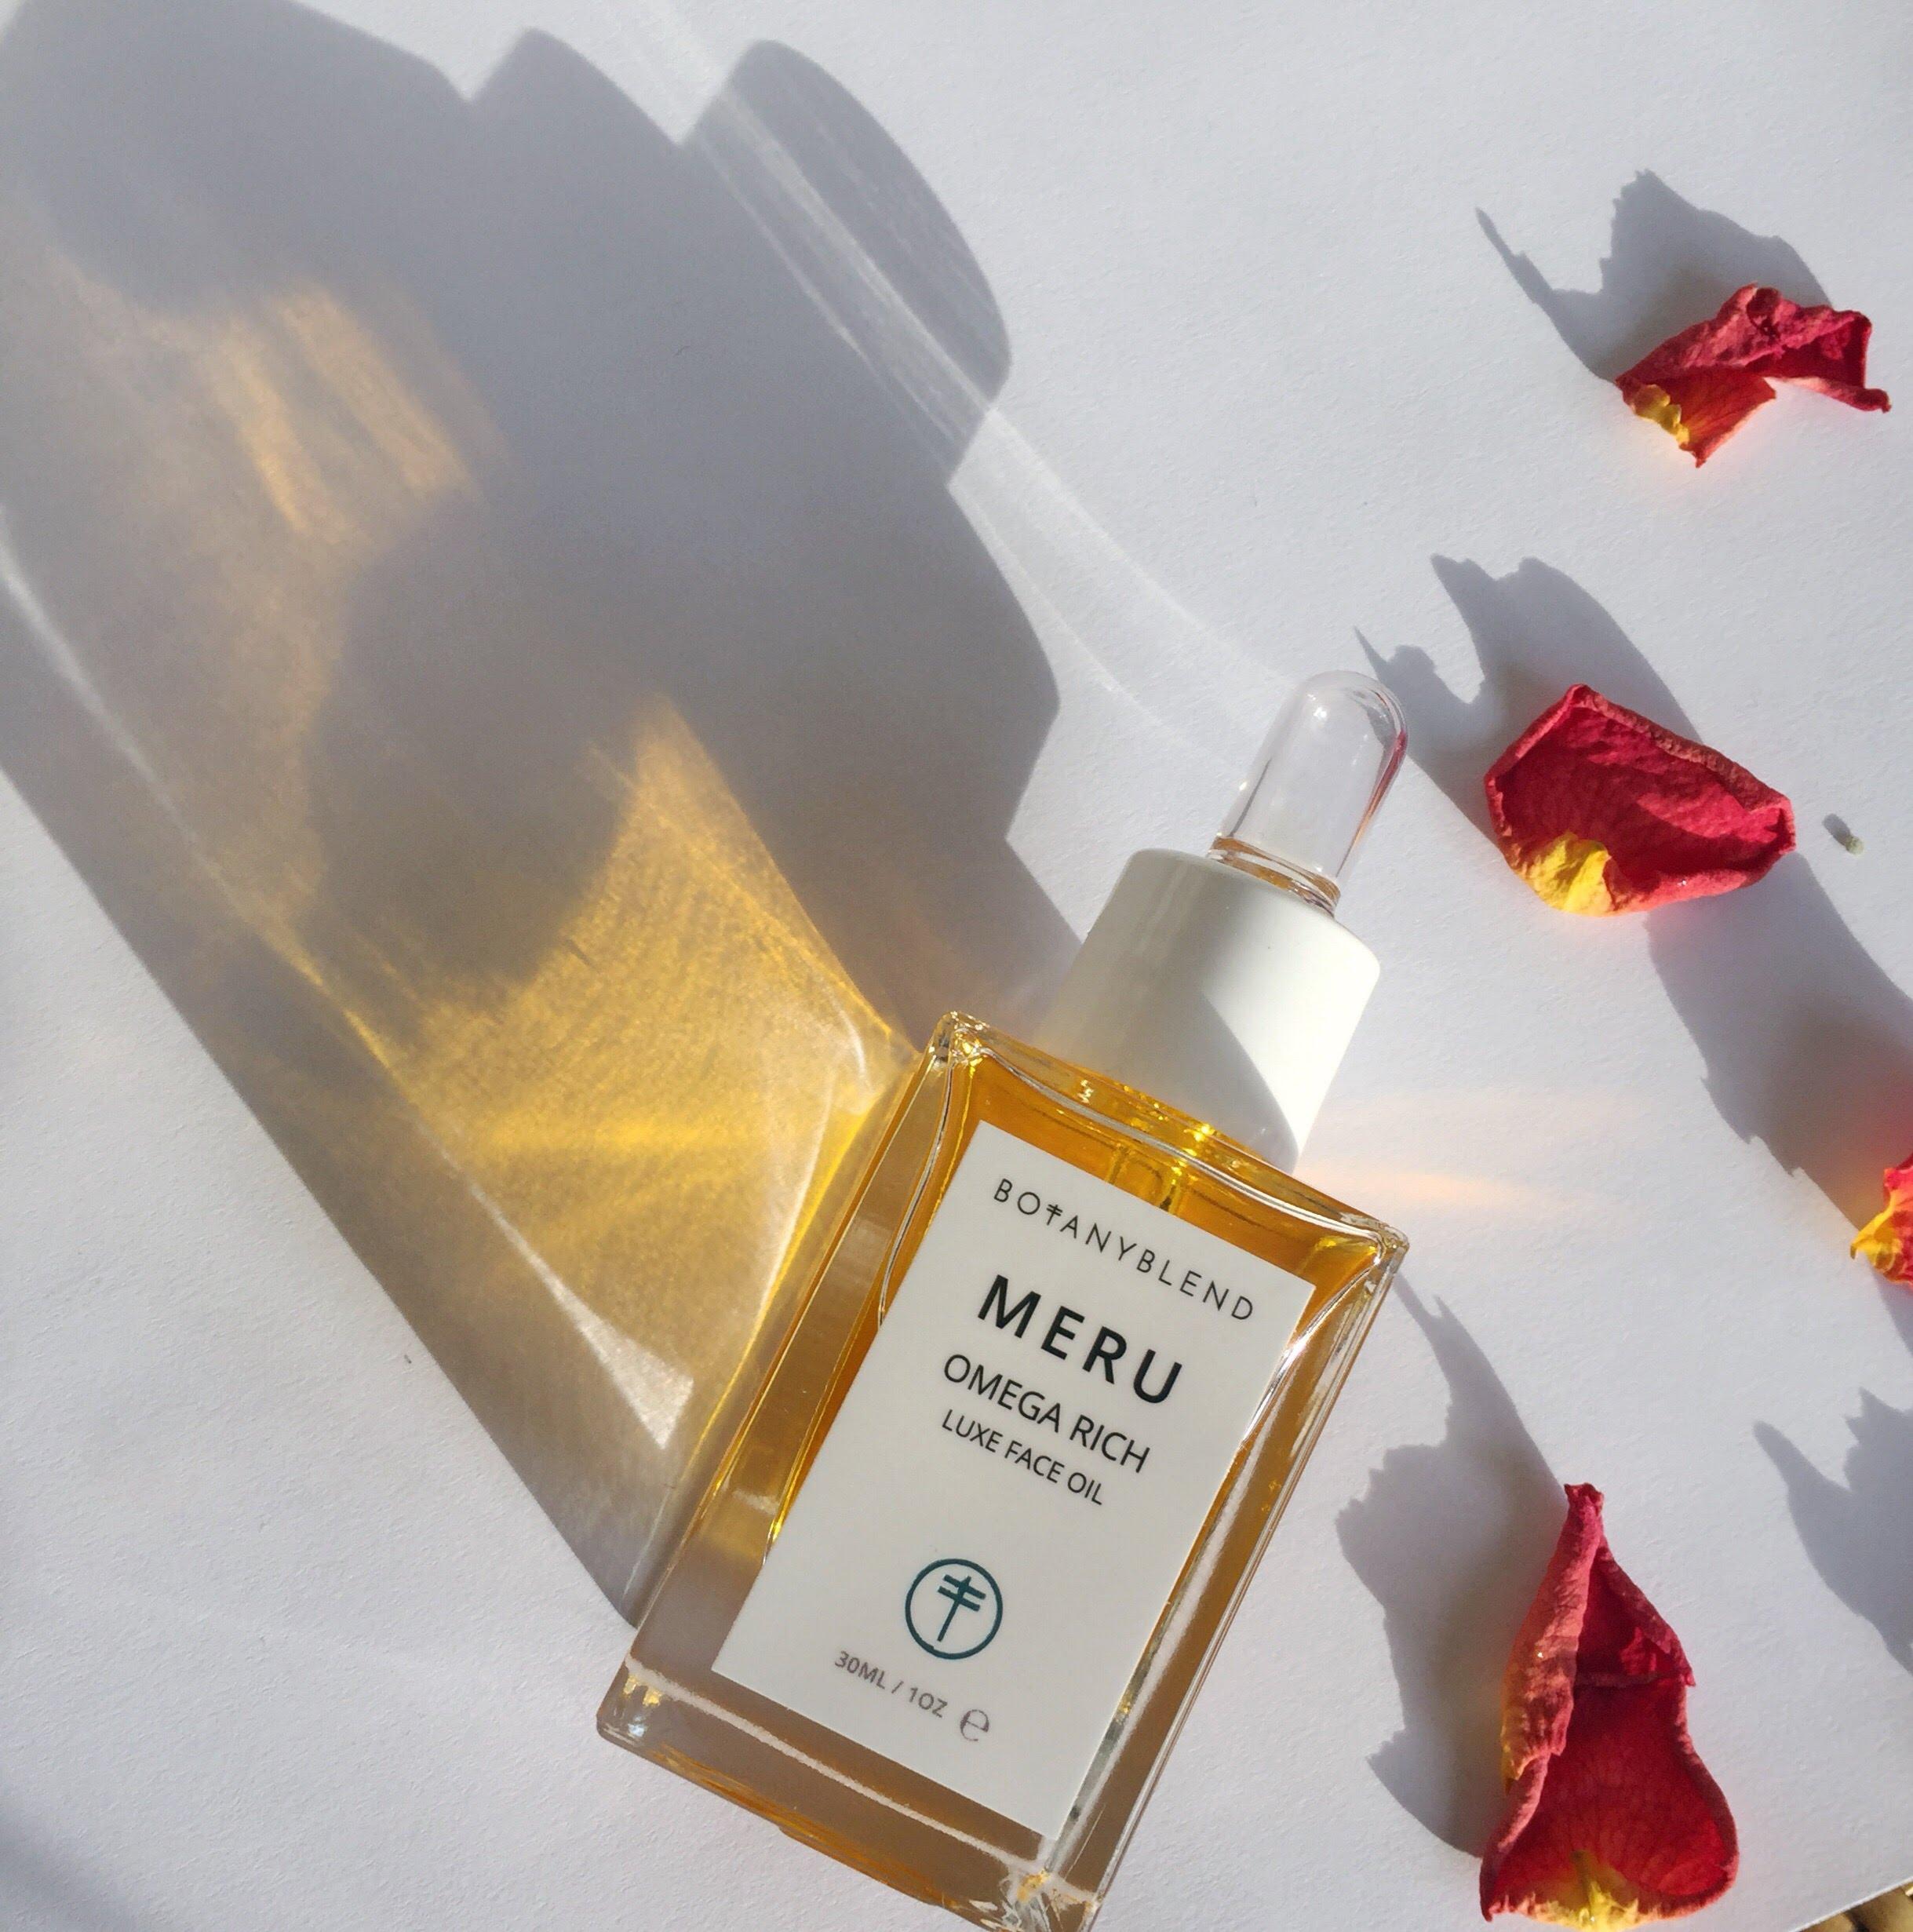 Botany Blend - Meru review